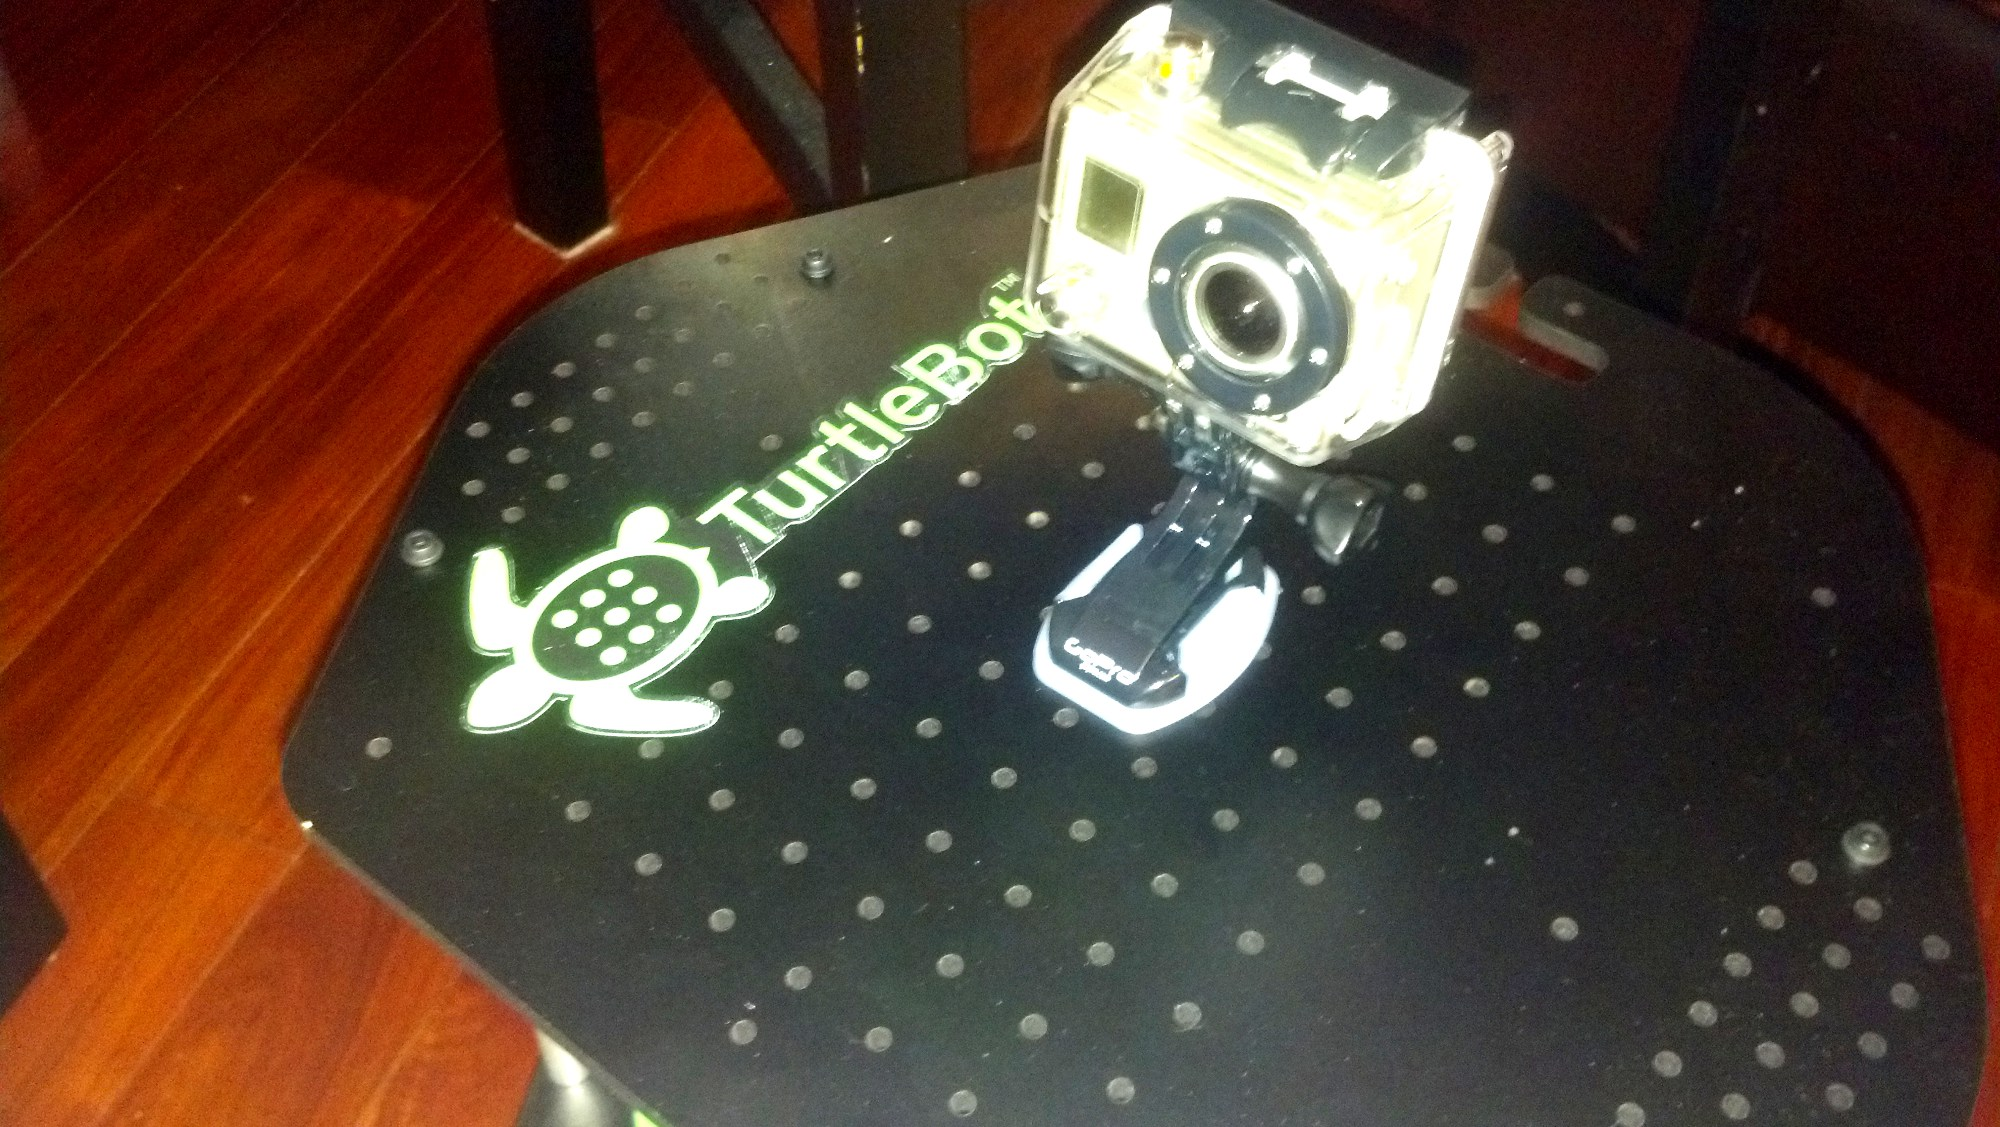 turtlebot2-gopro-mount-installed.jpg Download free STL file GoPro mount for Turtlebot 2 top plate • 3D printing object, Nessun_Dorma